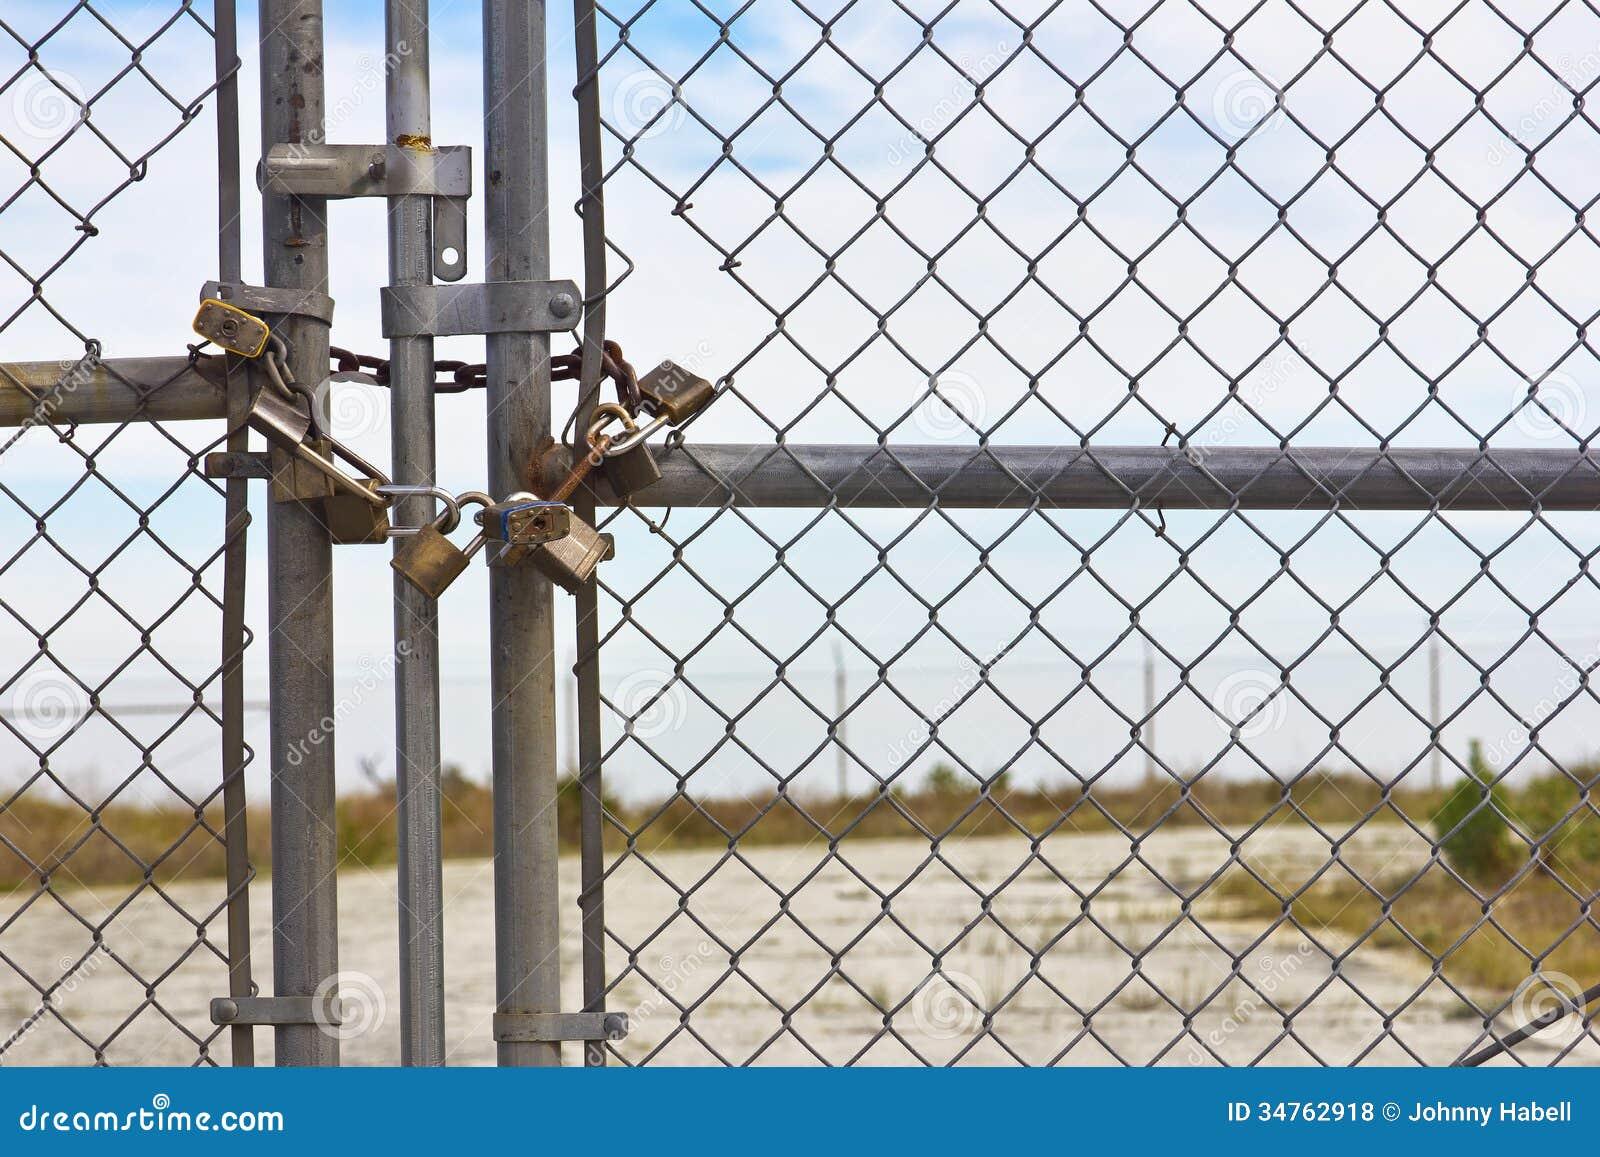 Fence Gates Locks For Chain Link Fence Gates